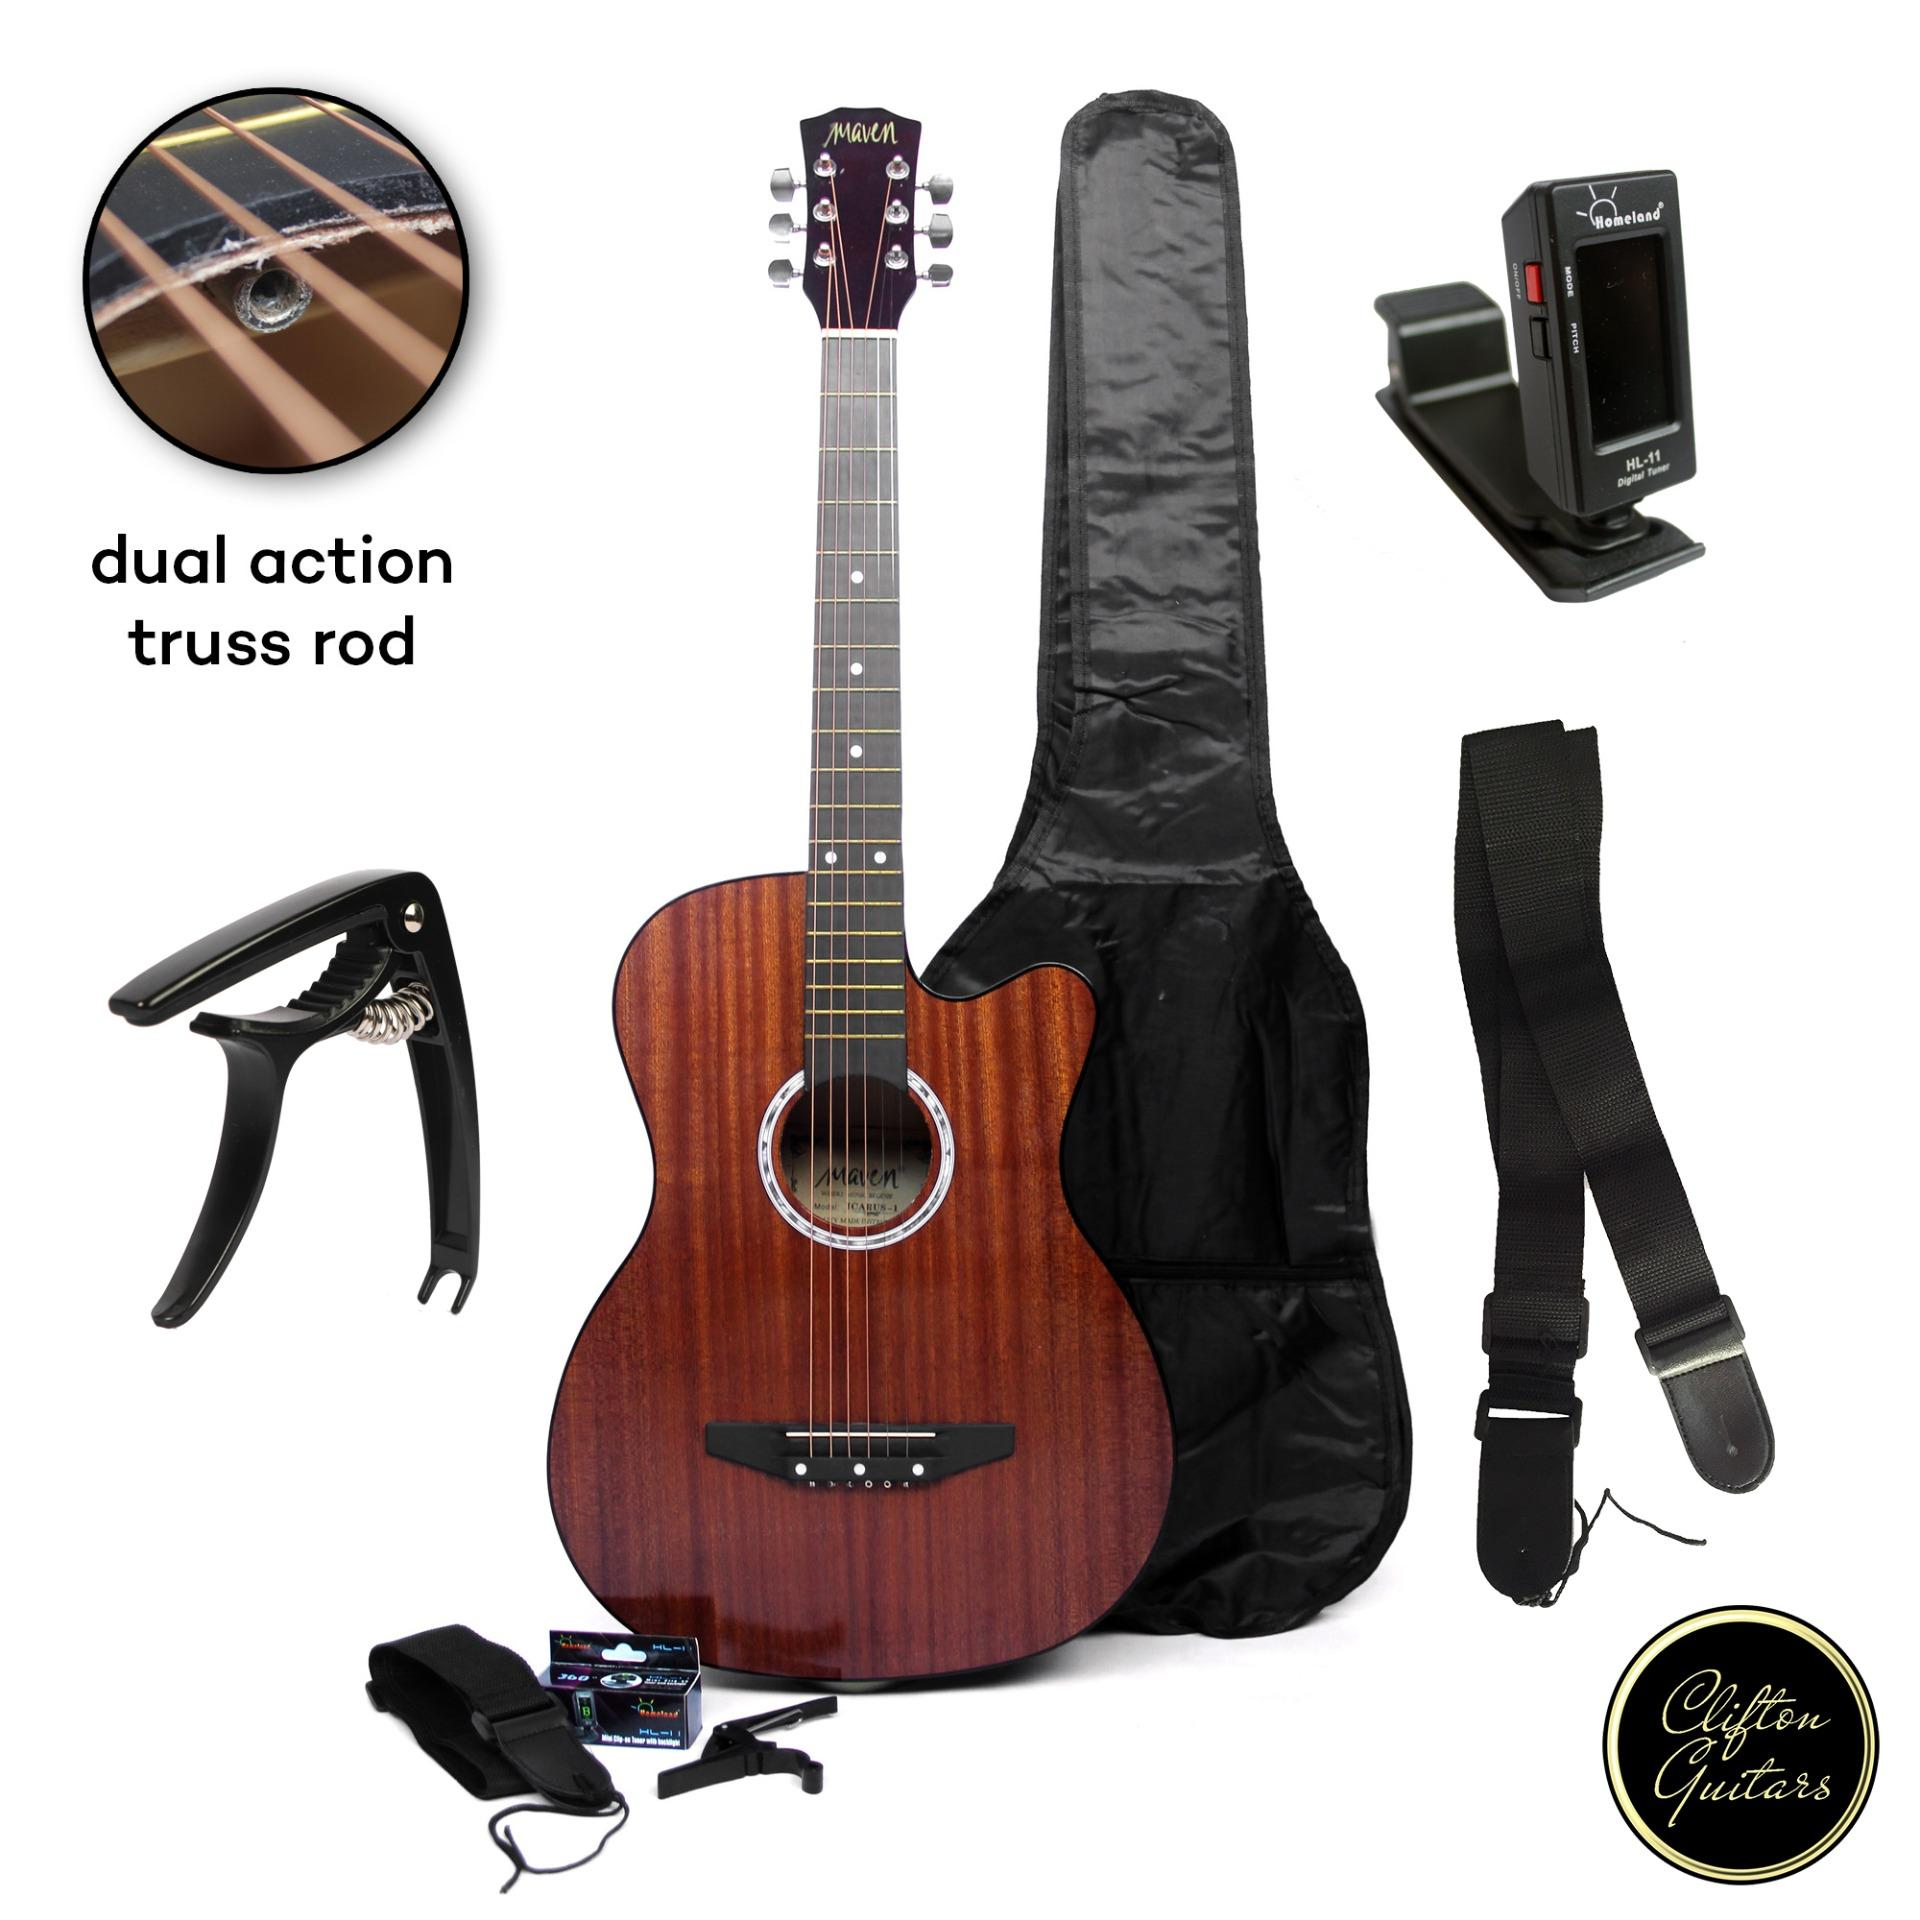 guitar for sale guitar instruments best seller prices brands in philippines. Black Bedroom Furniture Sets. Home Design Ideas